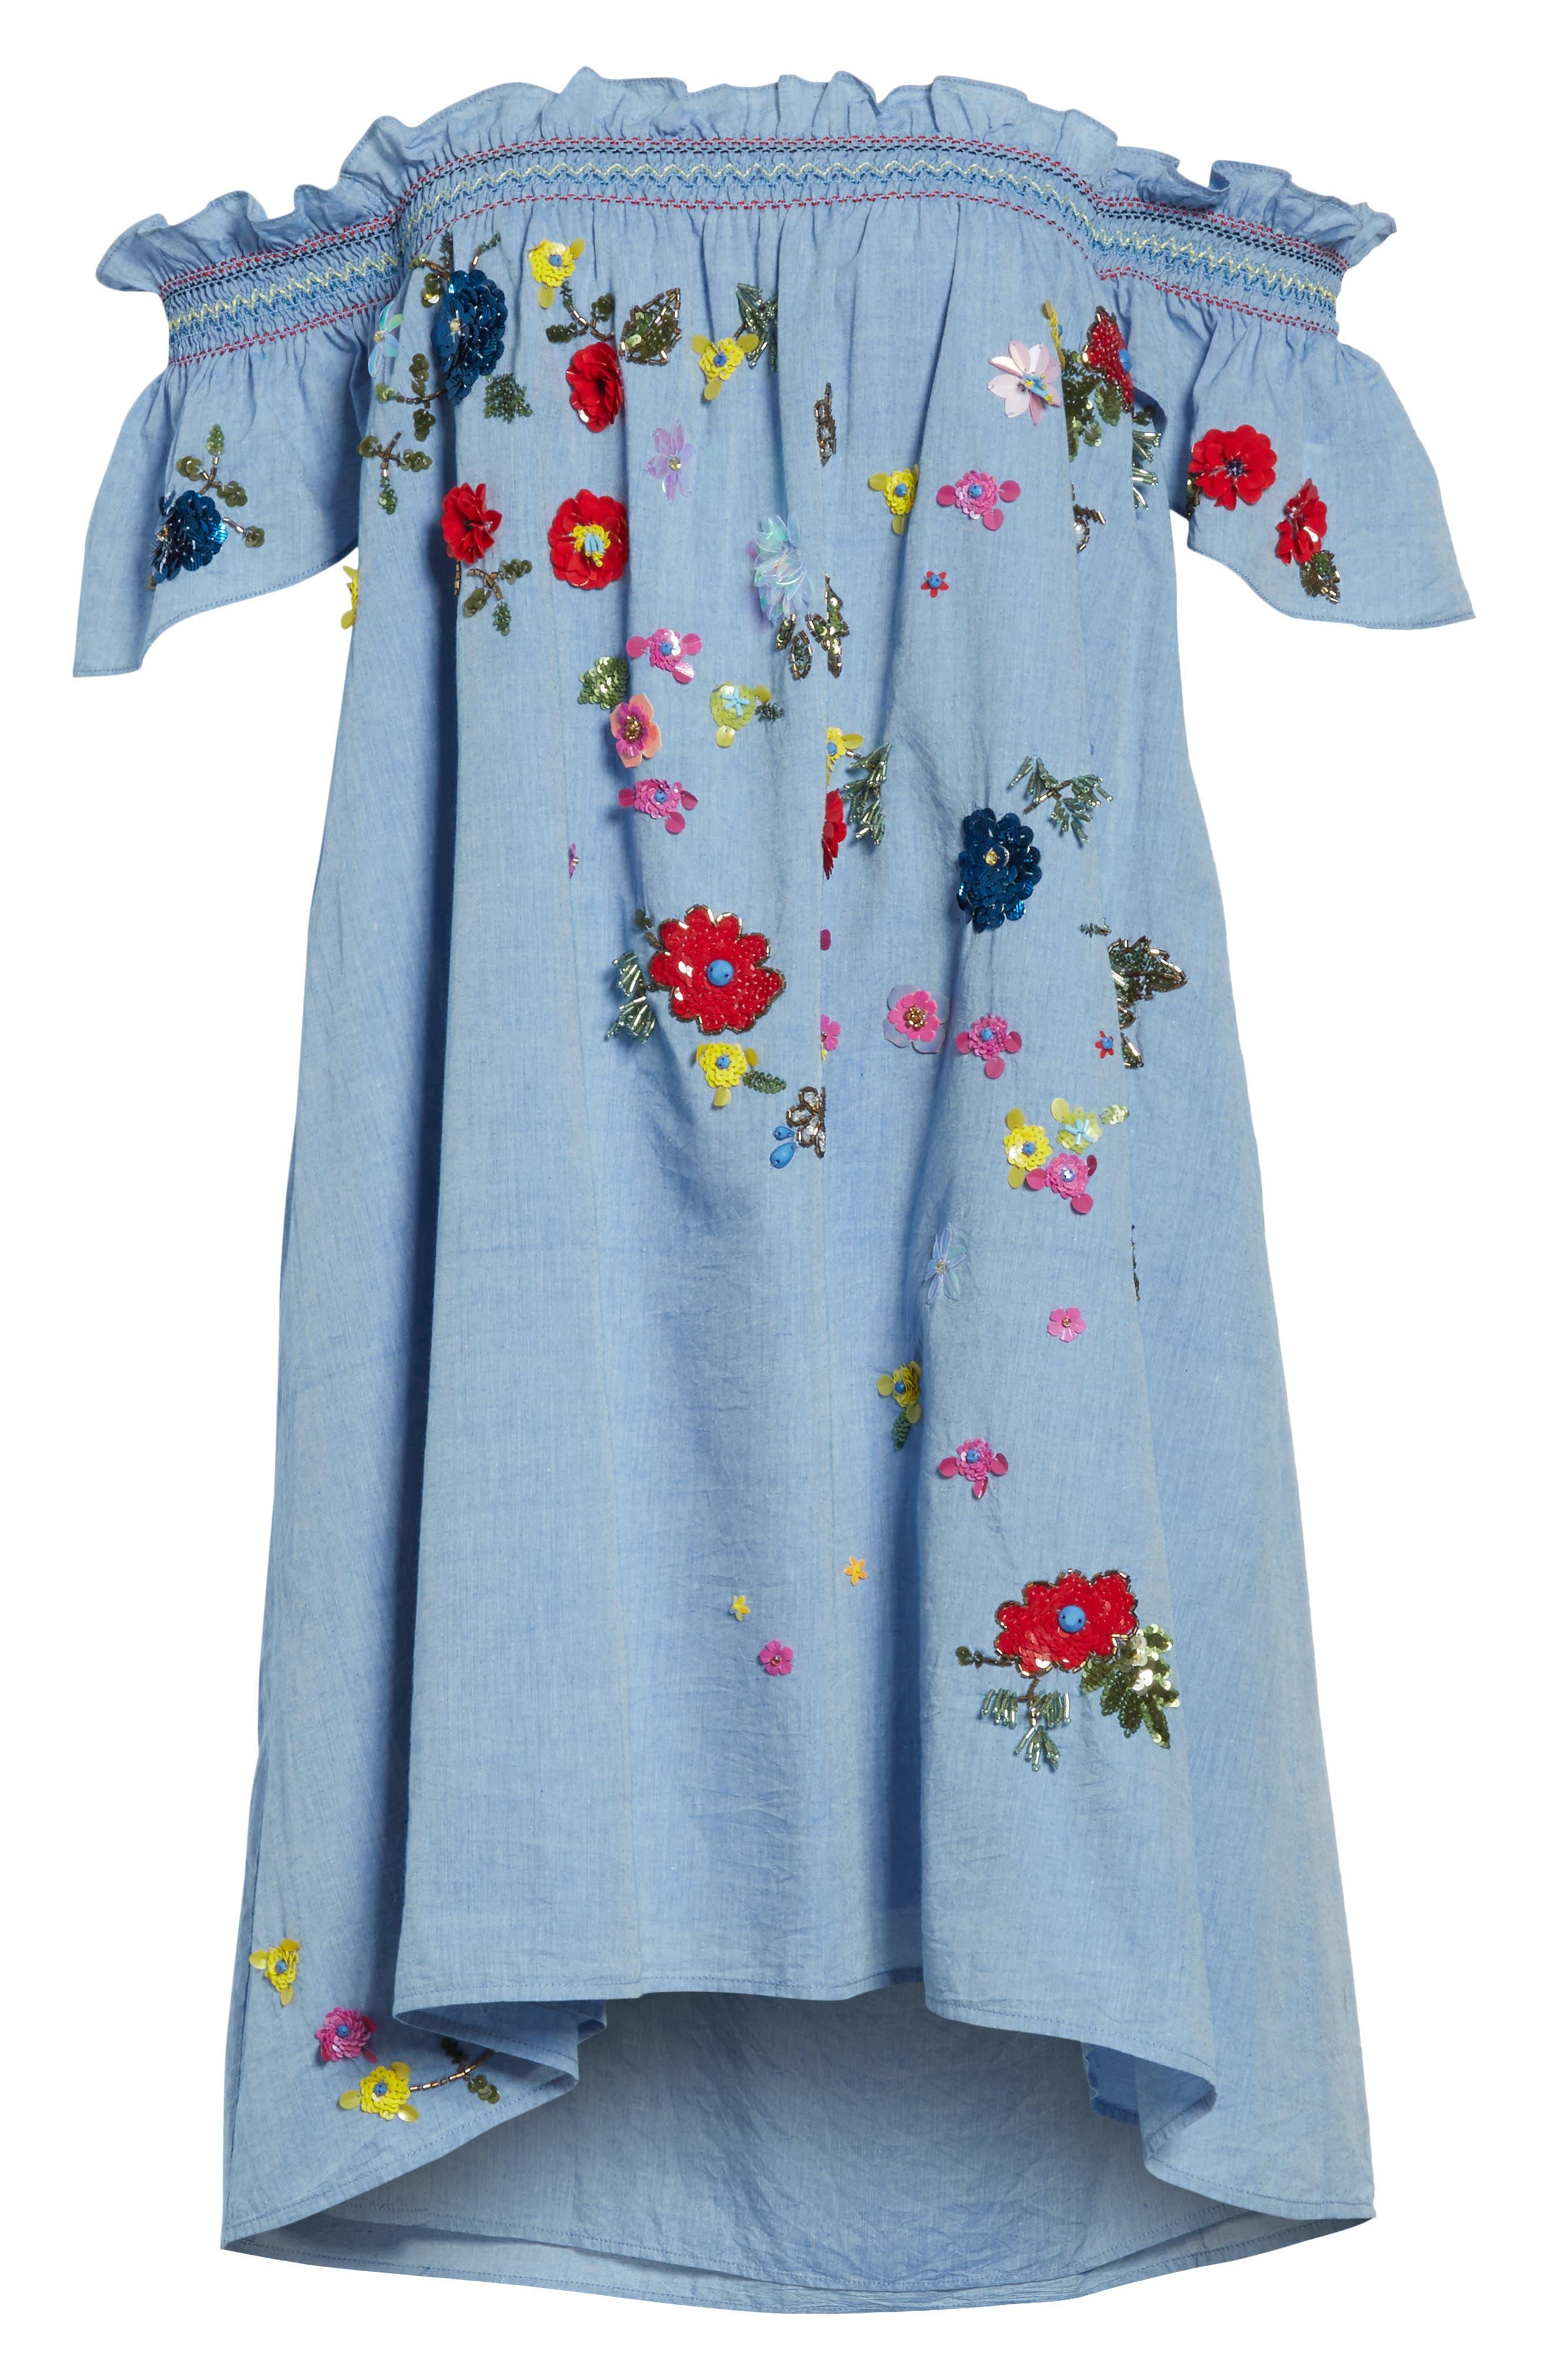 Clarimonde Embroidered Off the Shoulder Cotton Dress,                             Alternate thumbnail 6, color,                             400